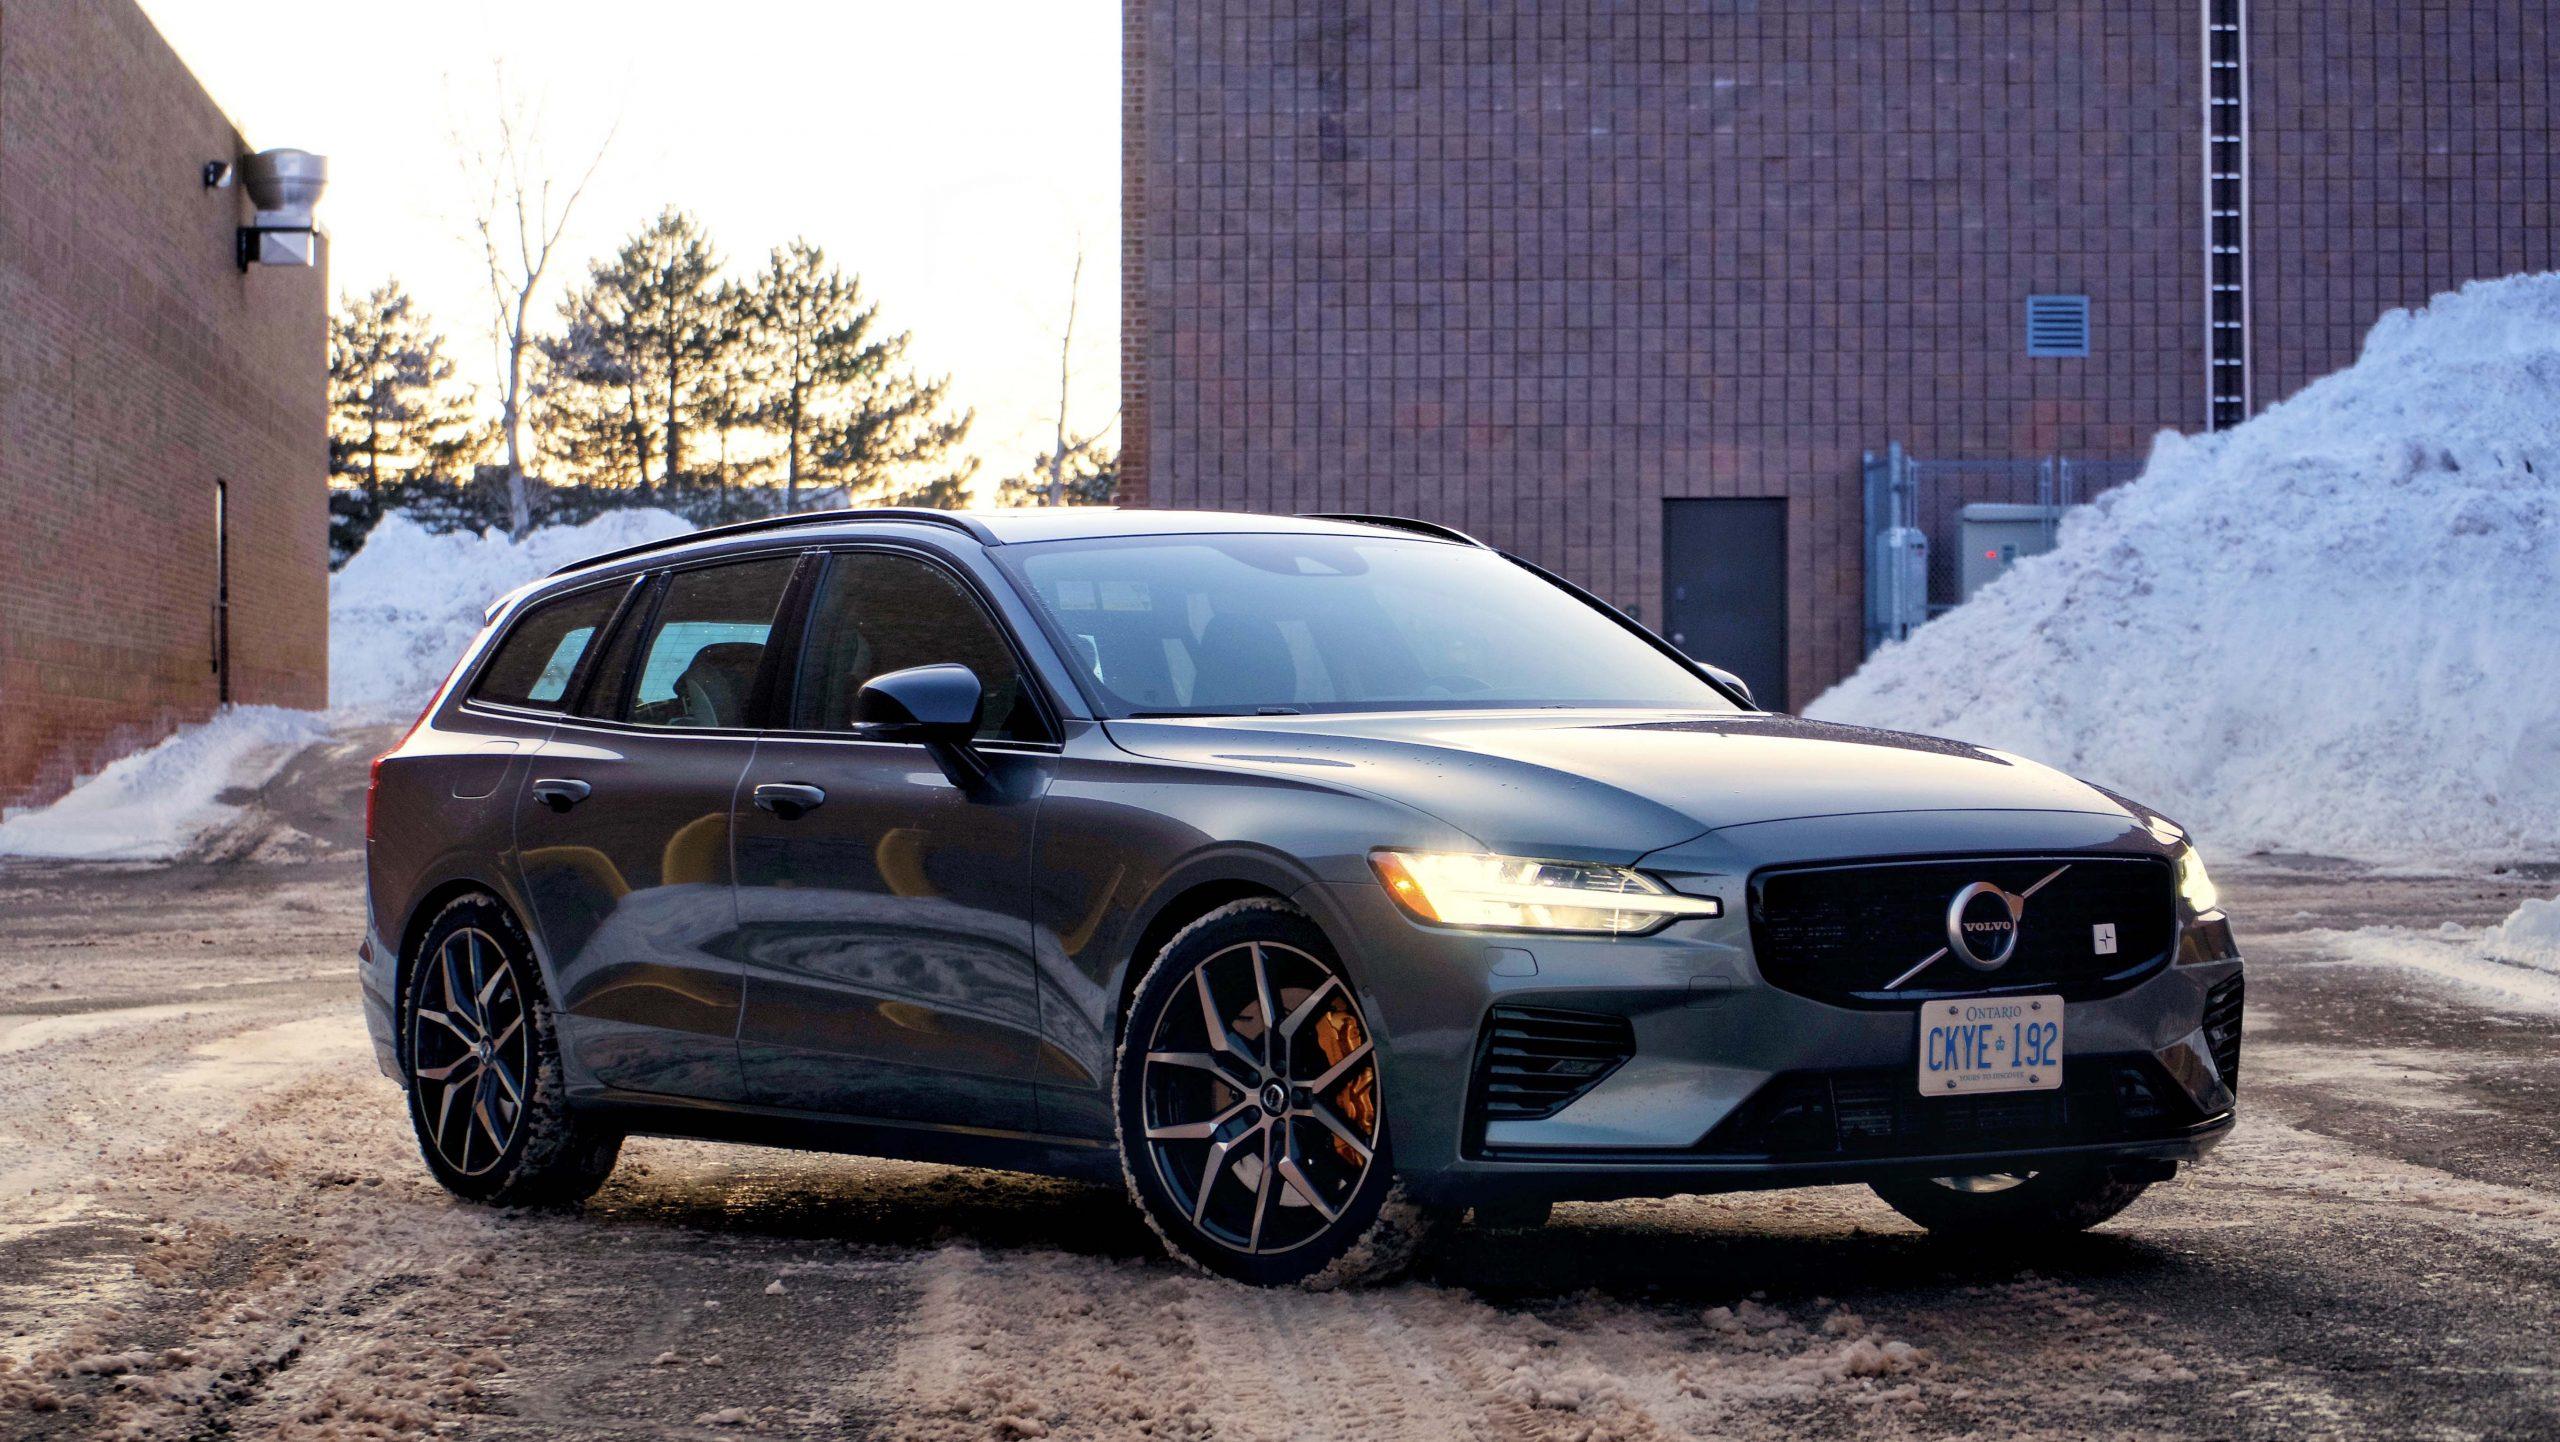 2020 Volvo S60 Polestar Price and Review